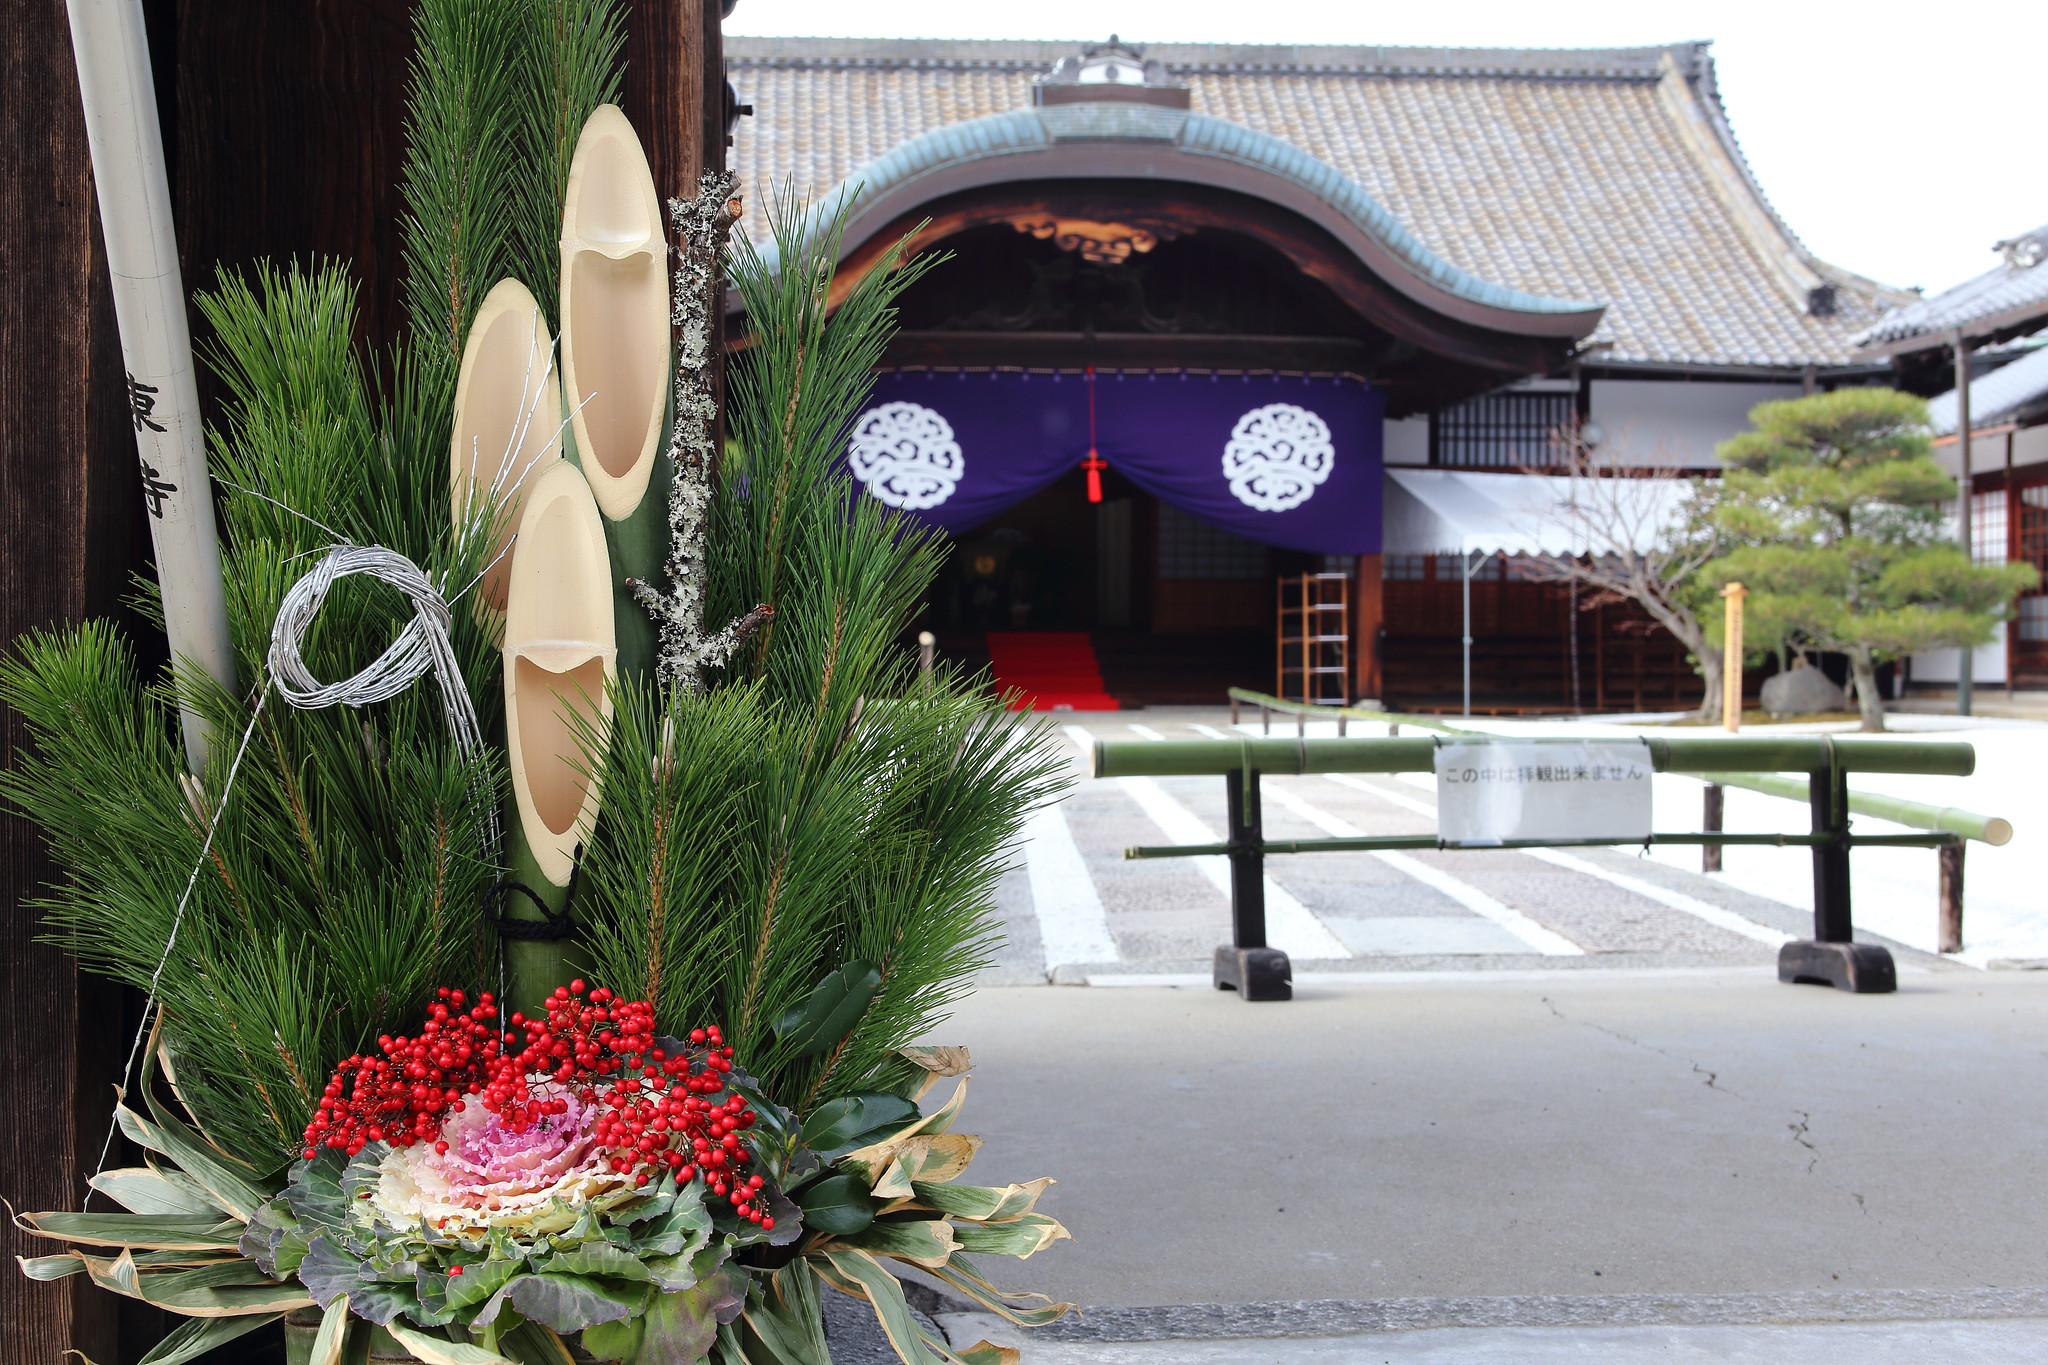 Kadomatsu --- ตกแต่งแบบดั้งเดิมสำหรับวันปีใหม่ ---